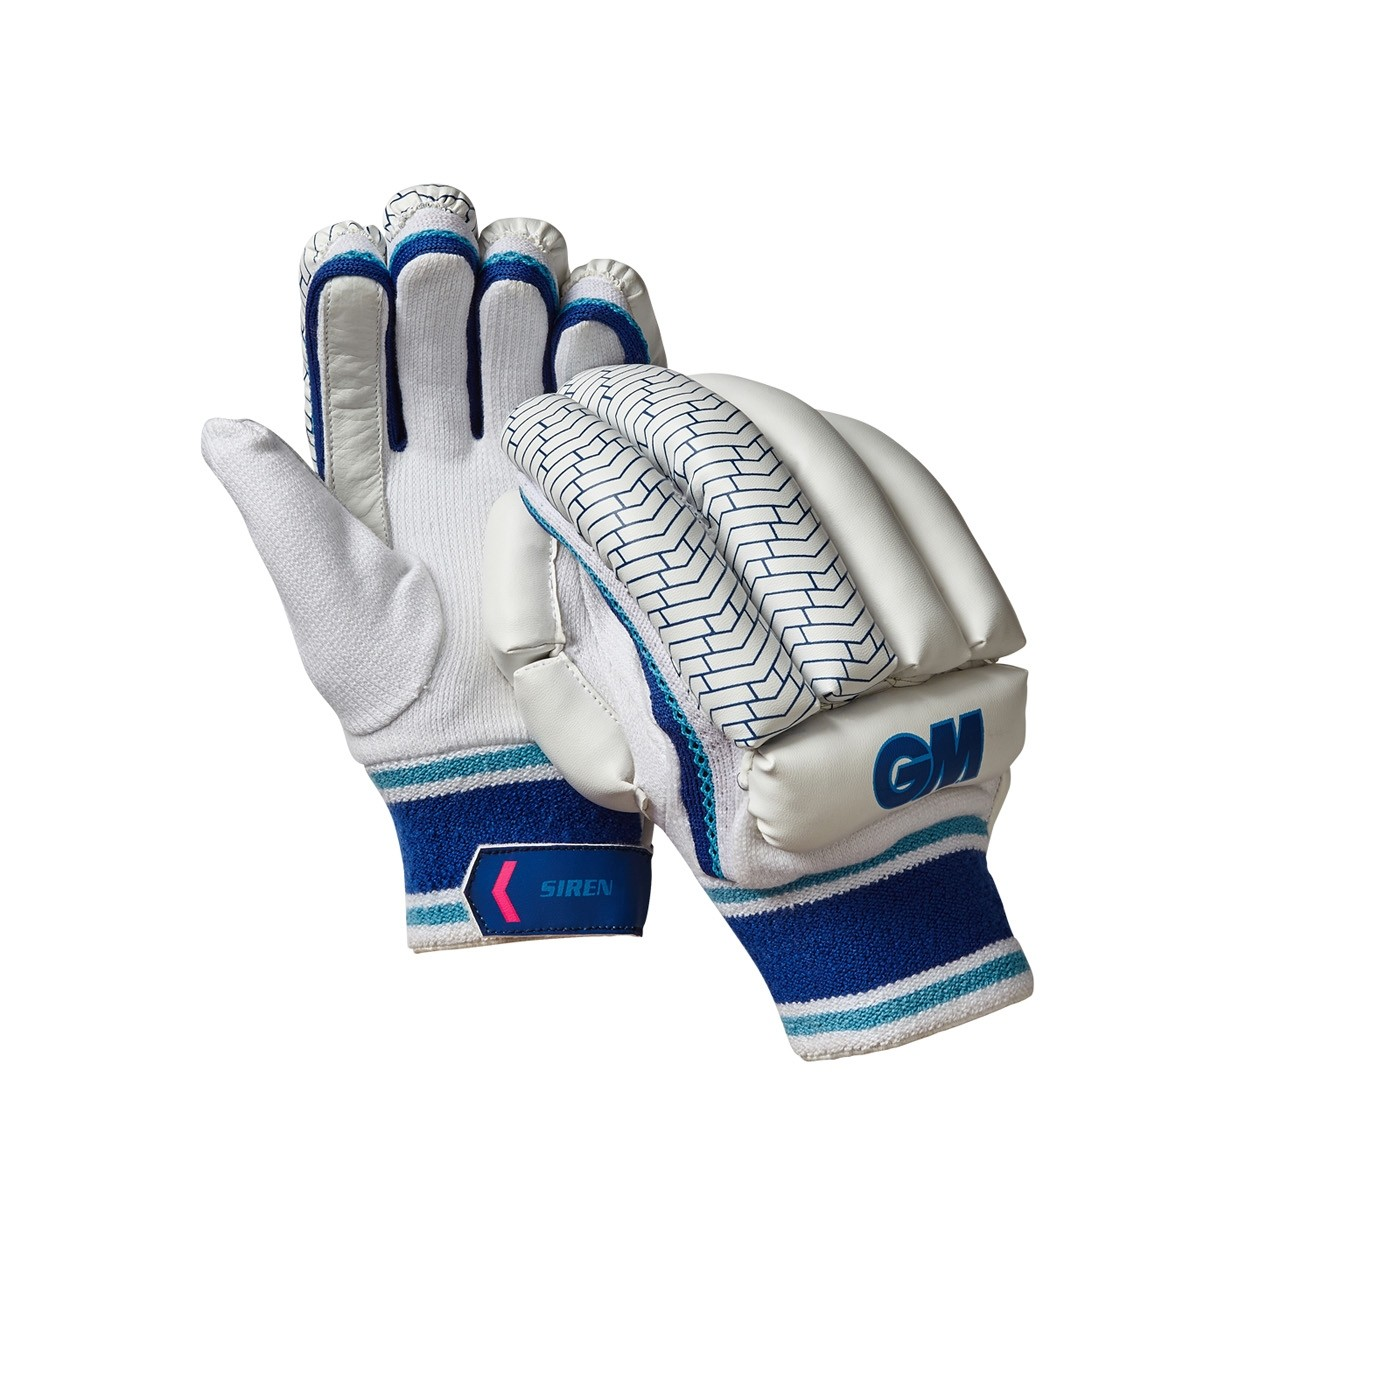 Gunn /& Moore 2020 Siren Batting Glove RH Or LH